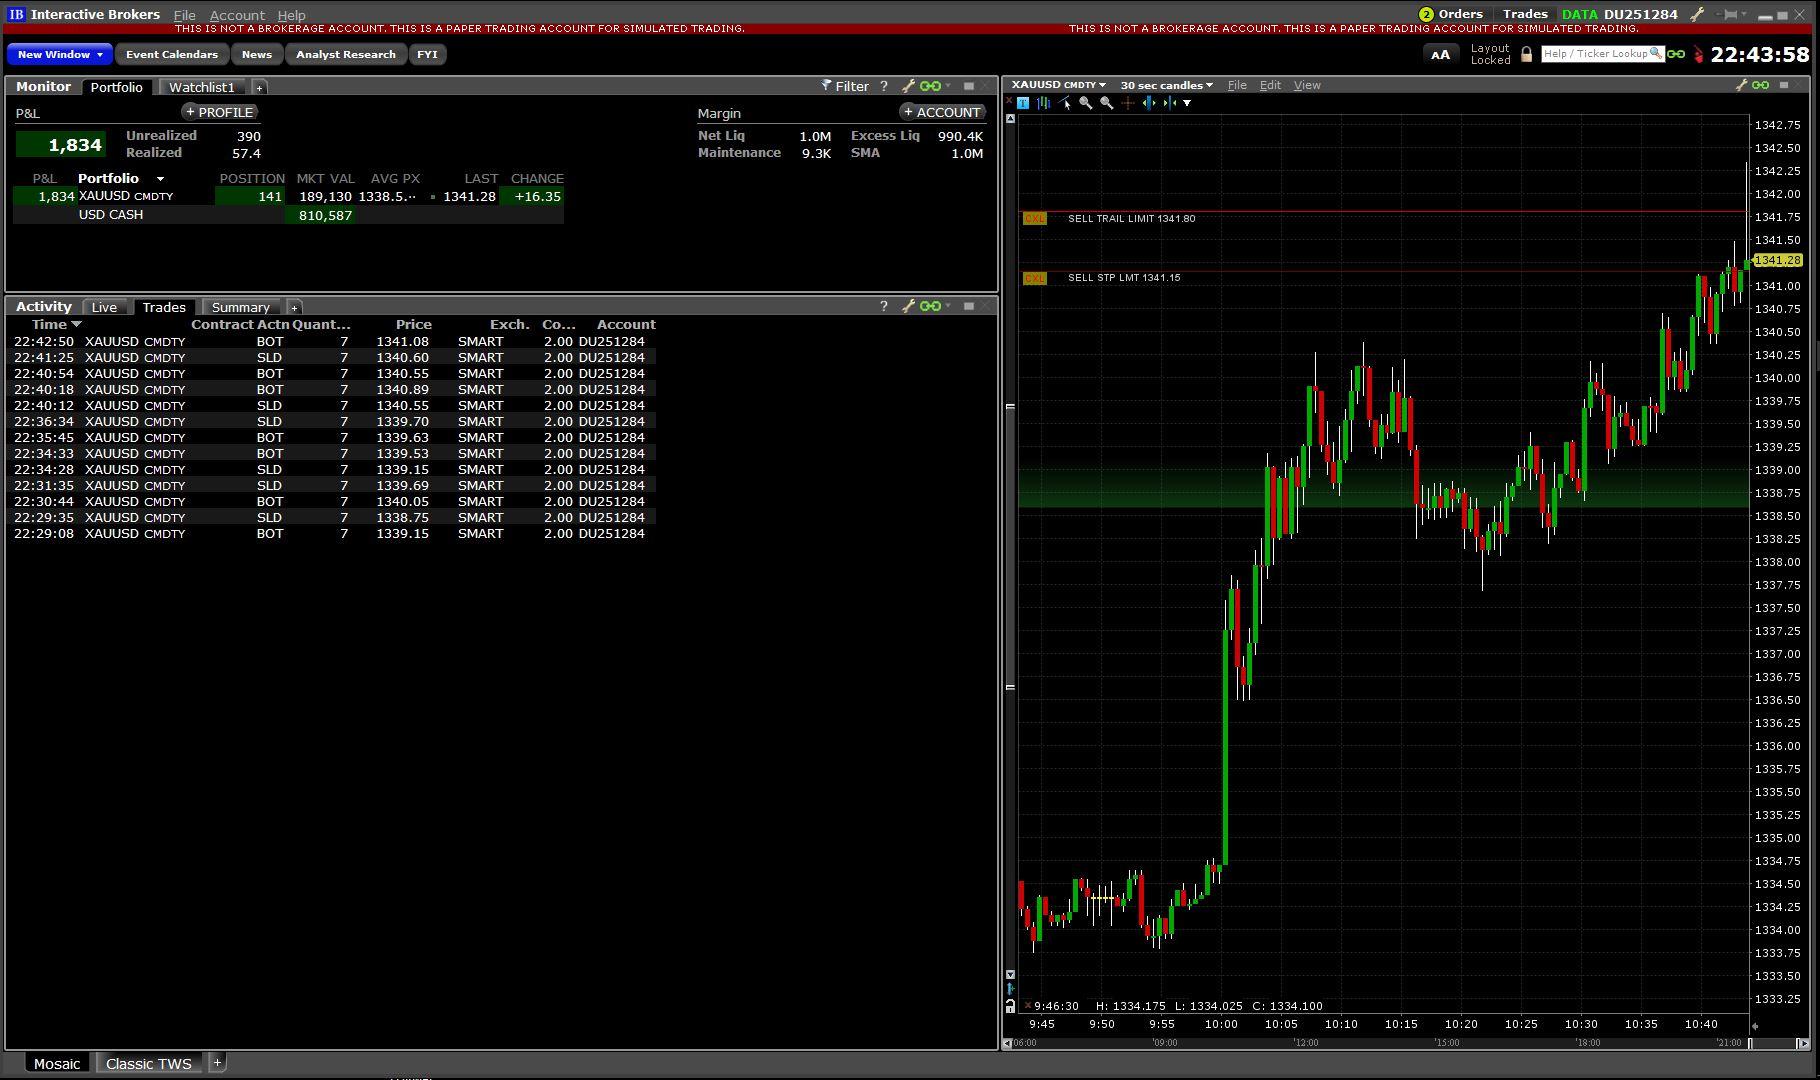 Options trading ib